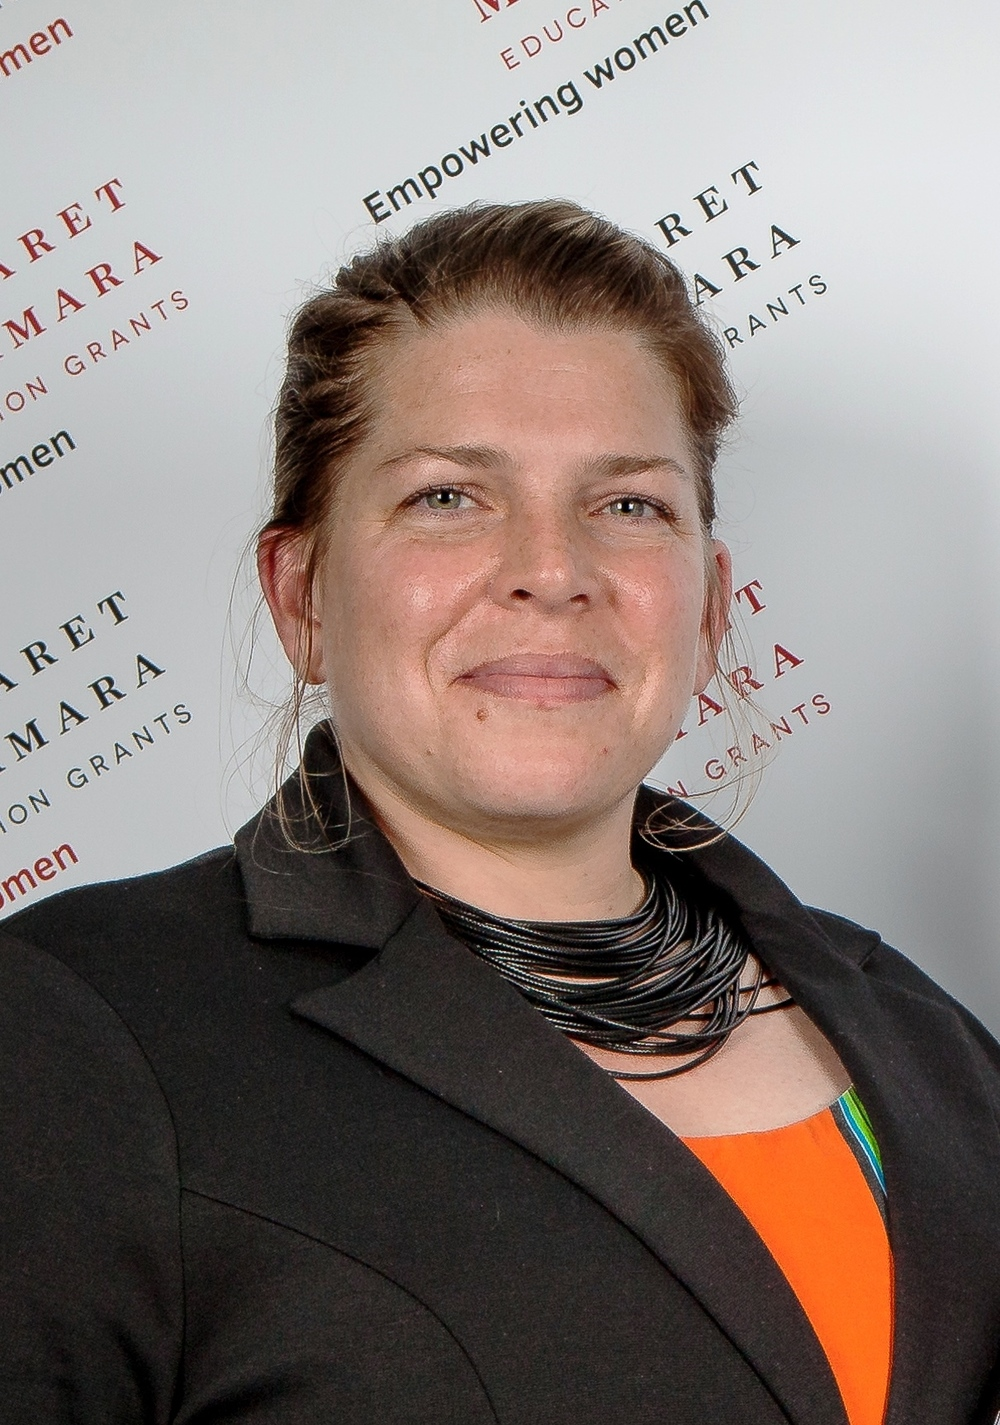 Ingrid Meintjes